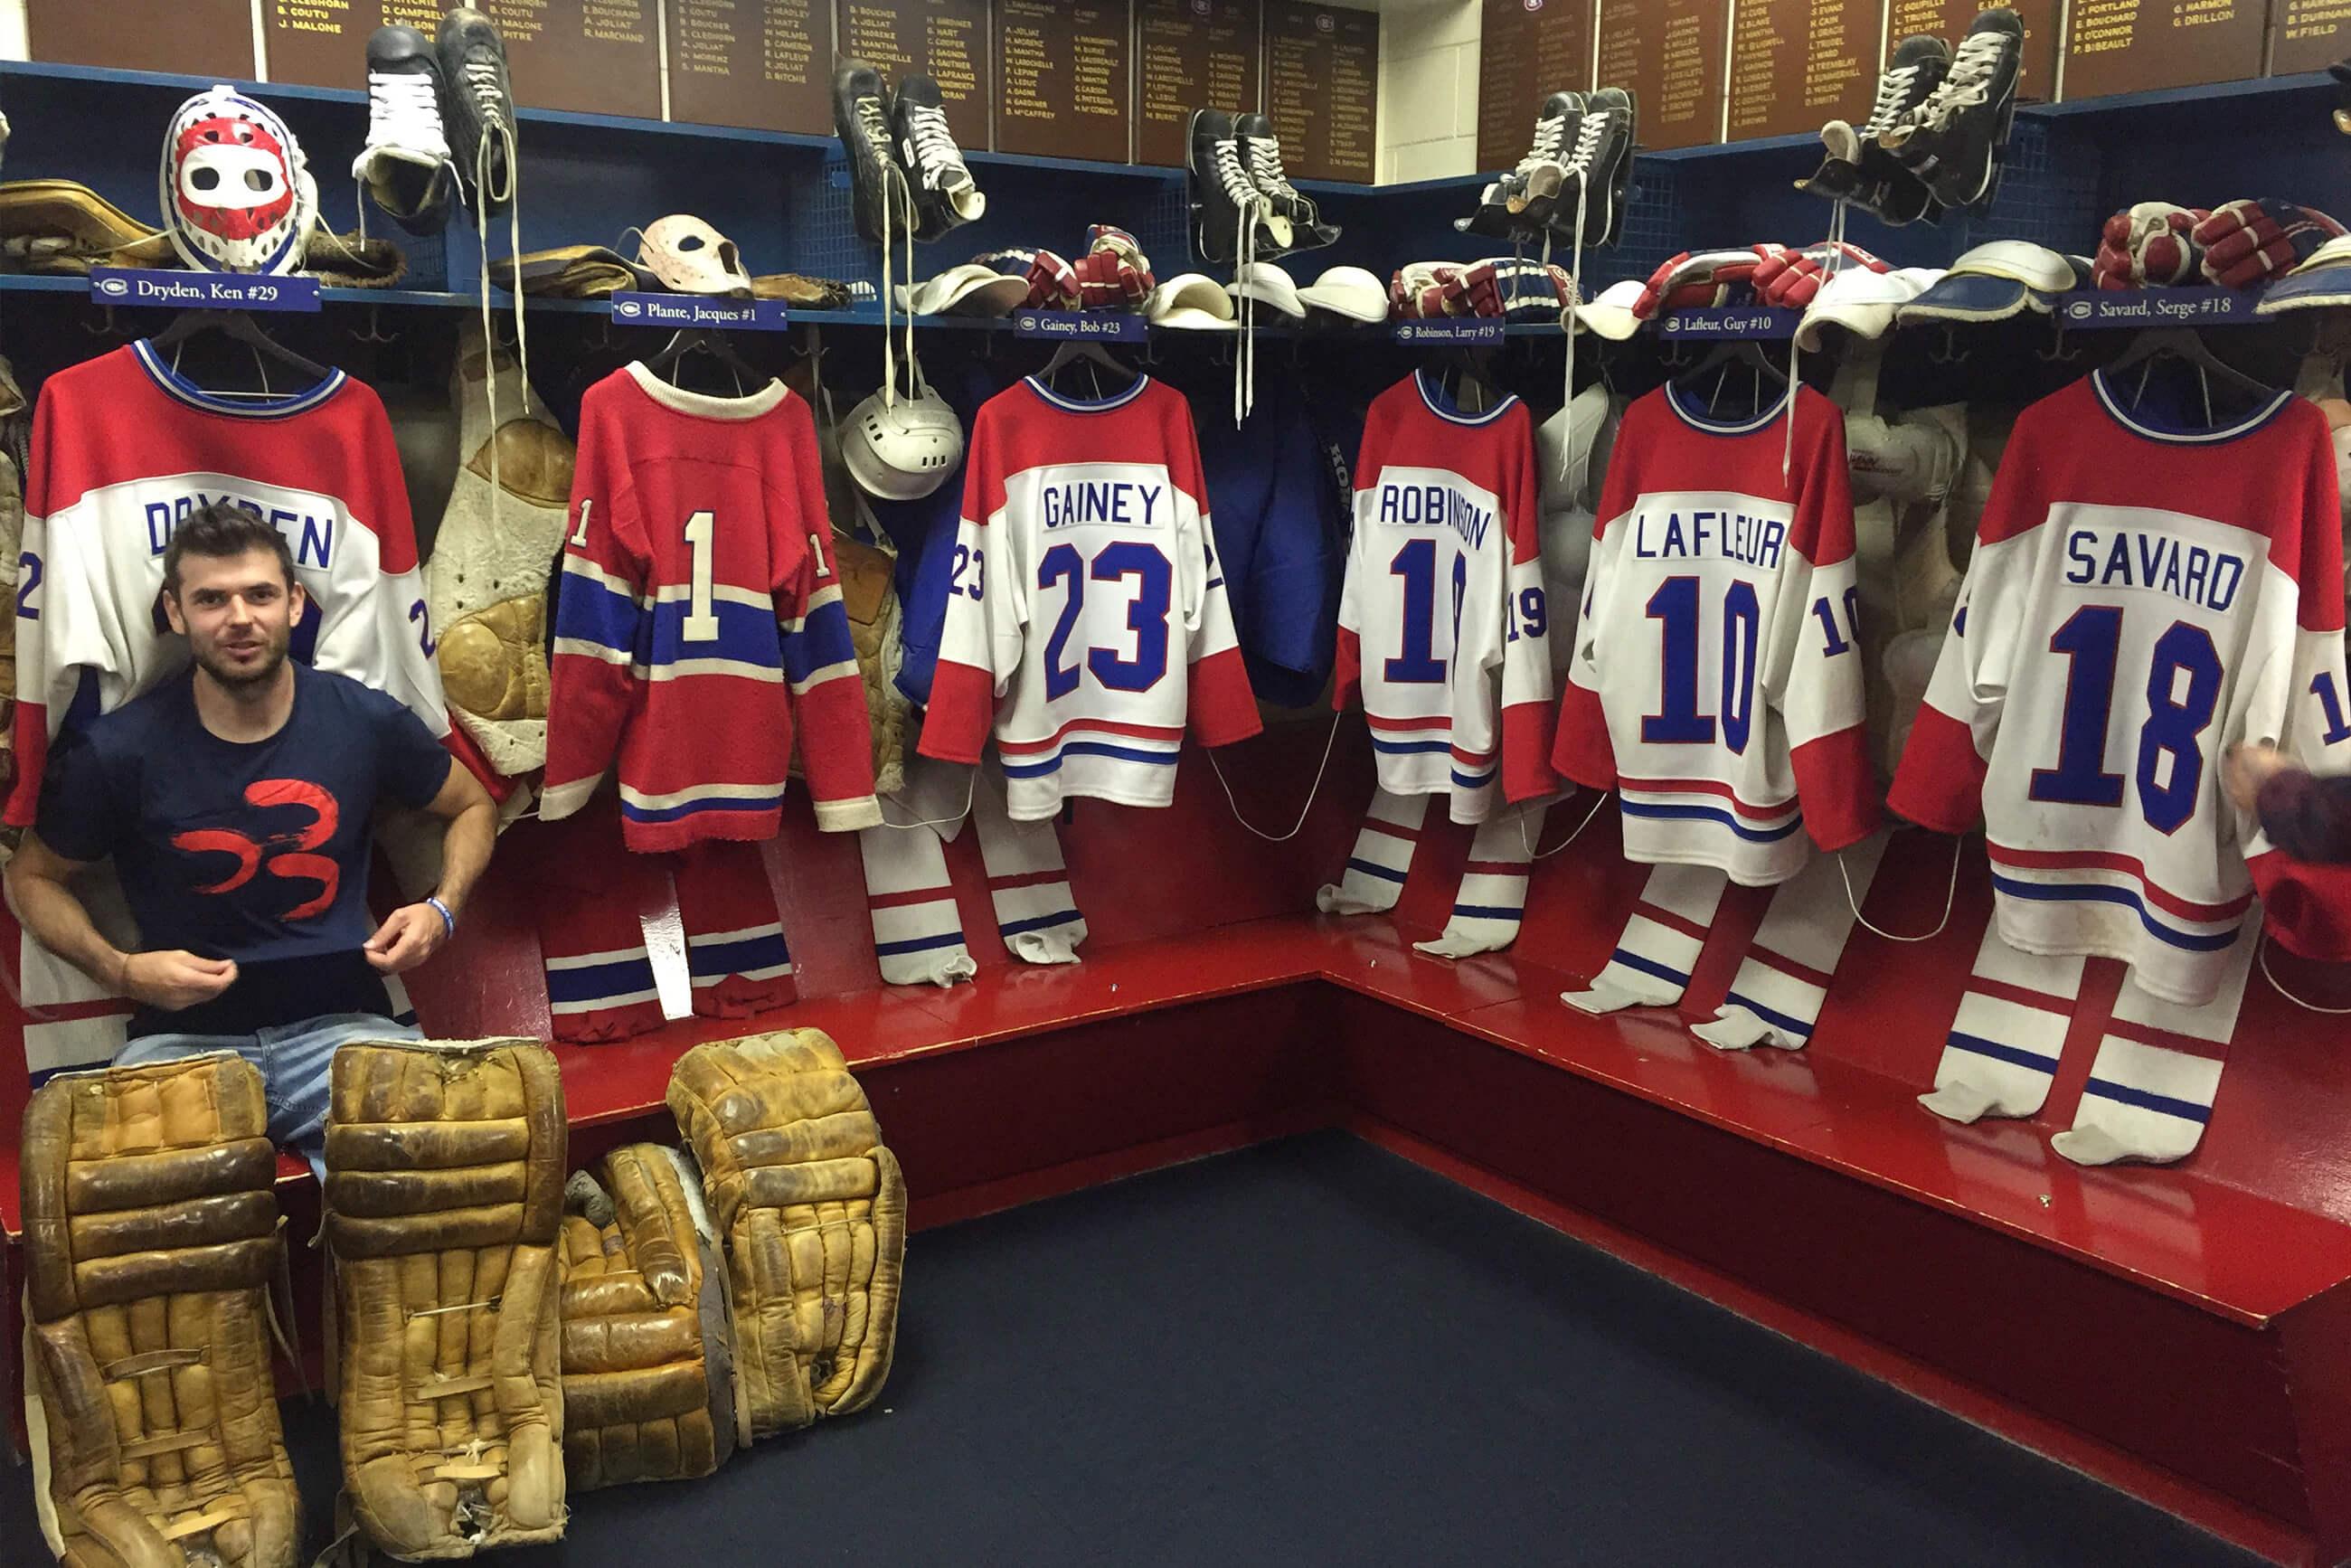 https://bubo.sk/uploads/galleries/7467/martinsimko_kanada_toronto_hokej.jpg